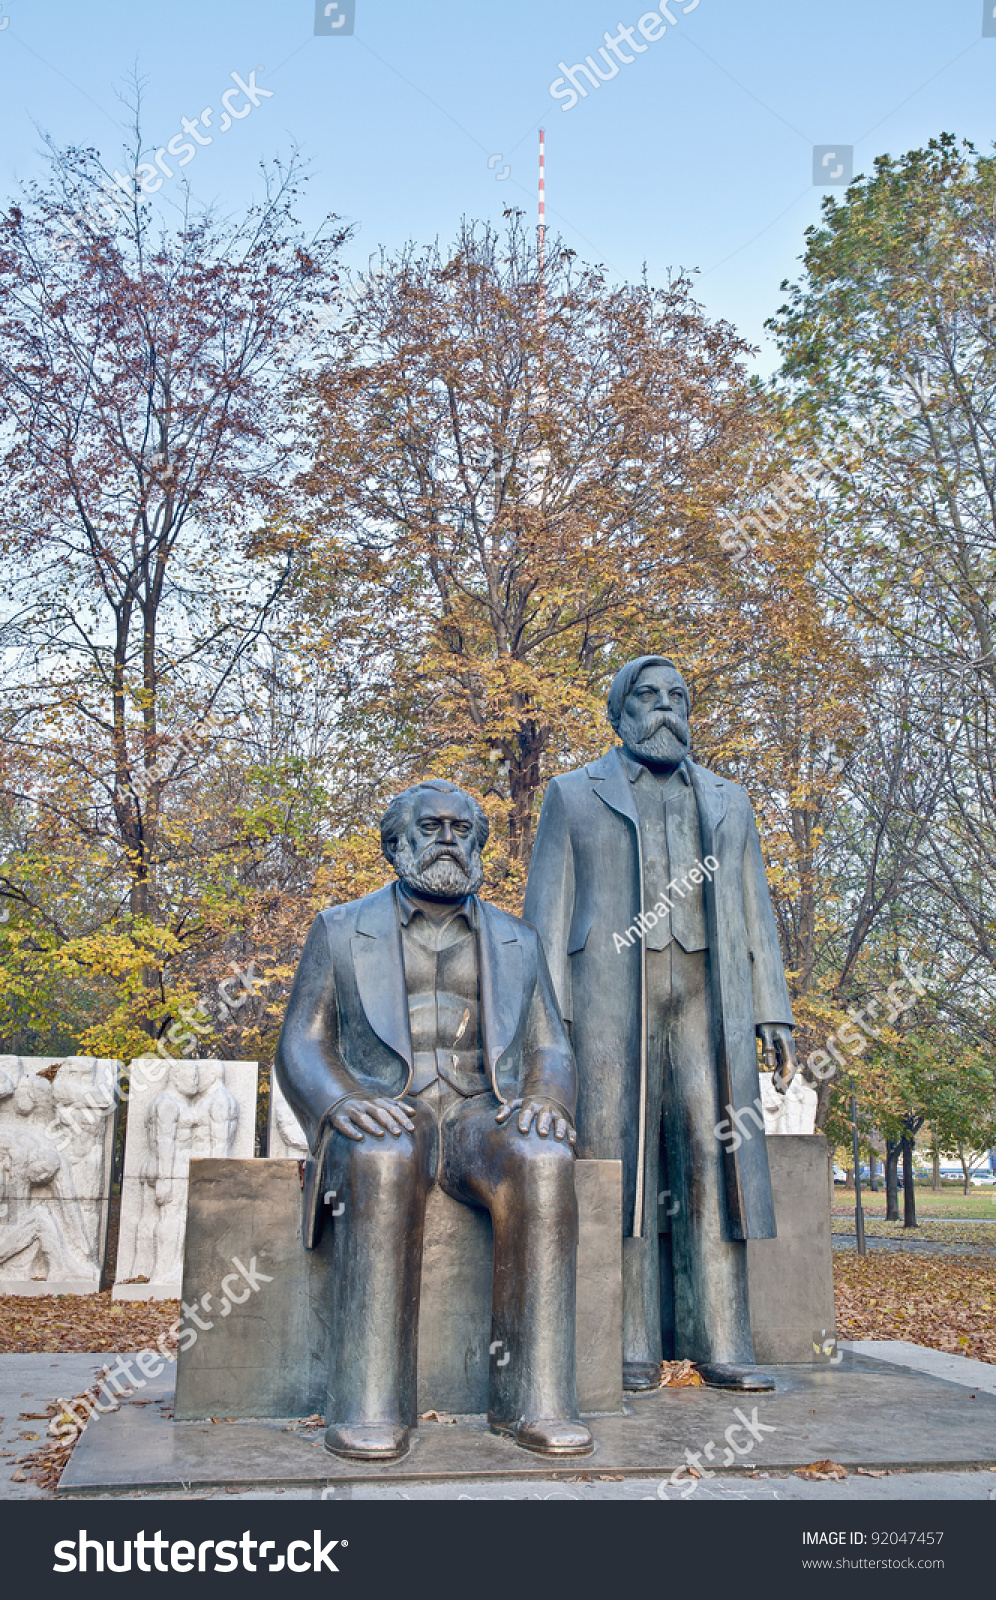 Marx And Engels The Communist Manifesto Essay  Coursework Help Marx And Engels The Communist Manifesto Essay